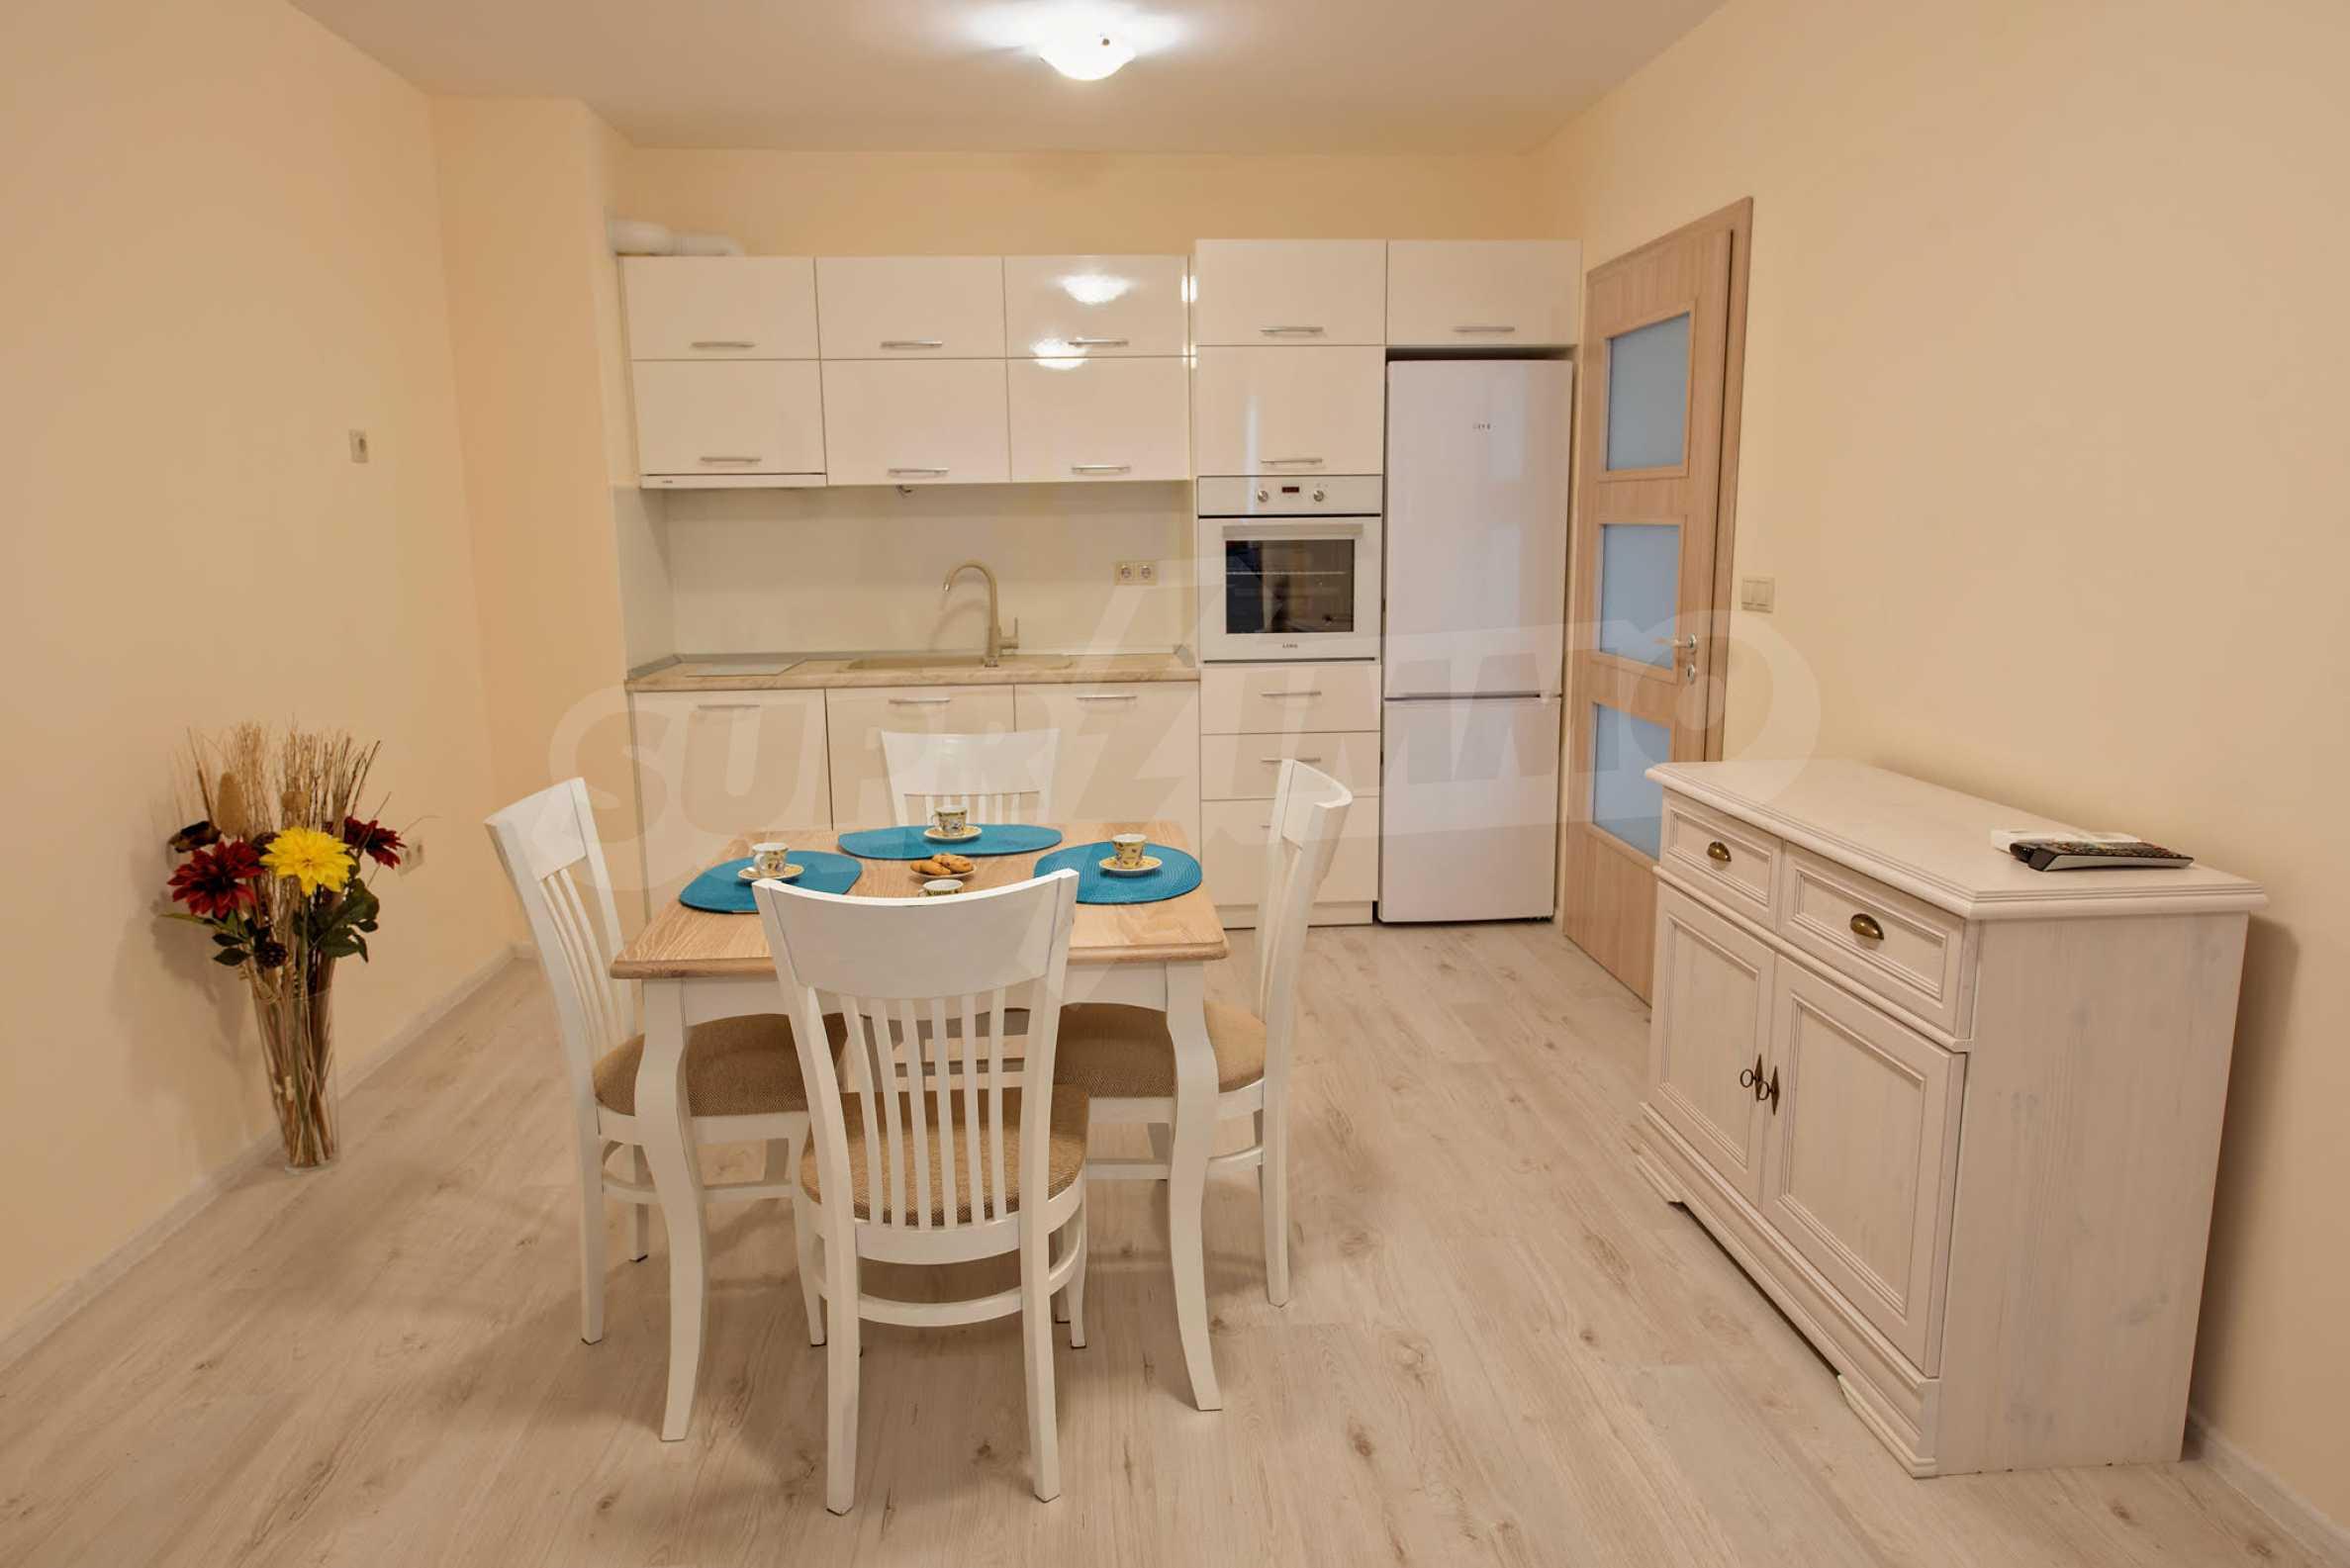 Двустаен апартамент във Варна Саут Бей / Varna South Bay 4